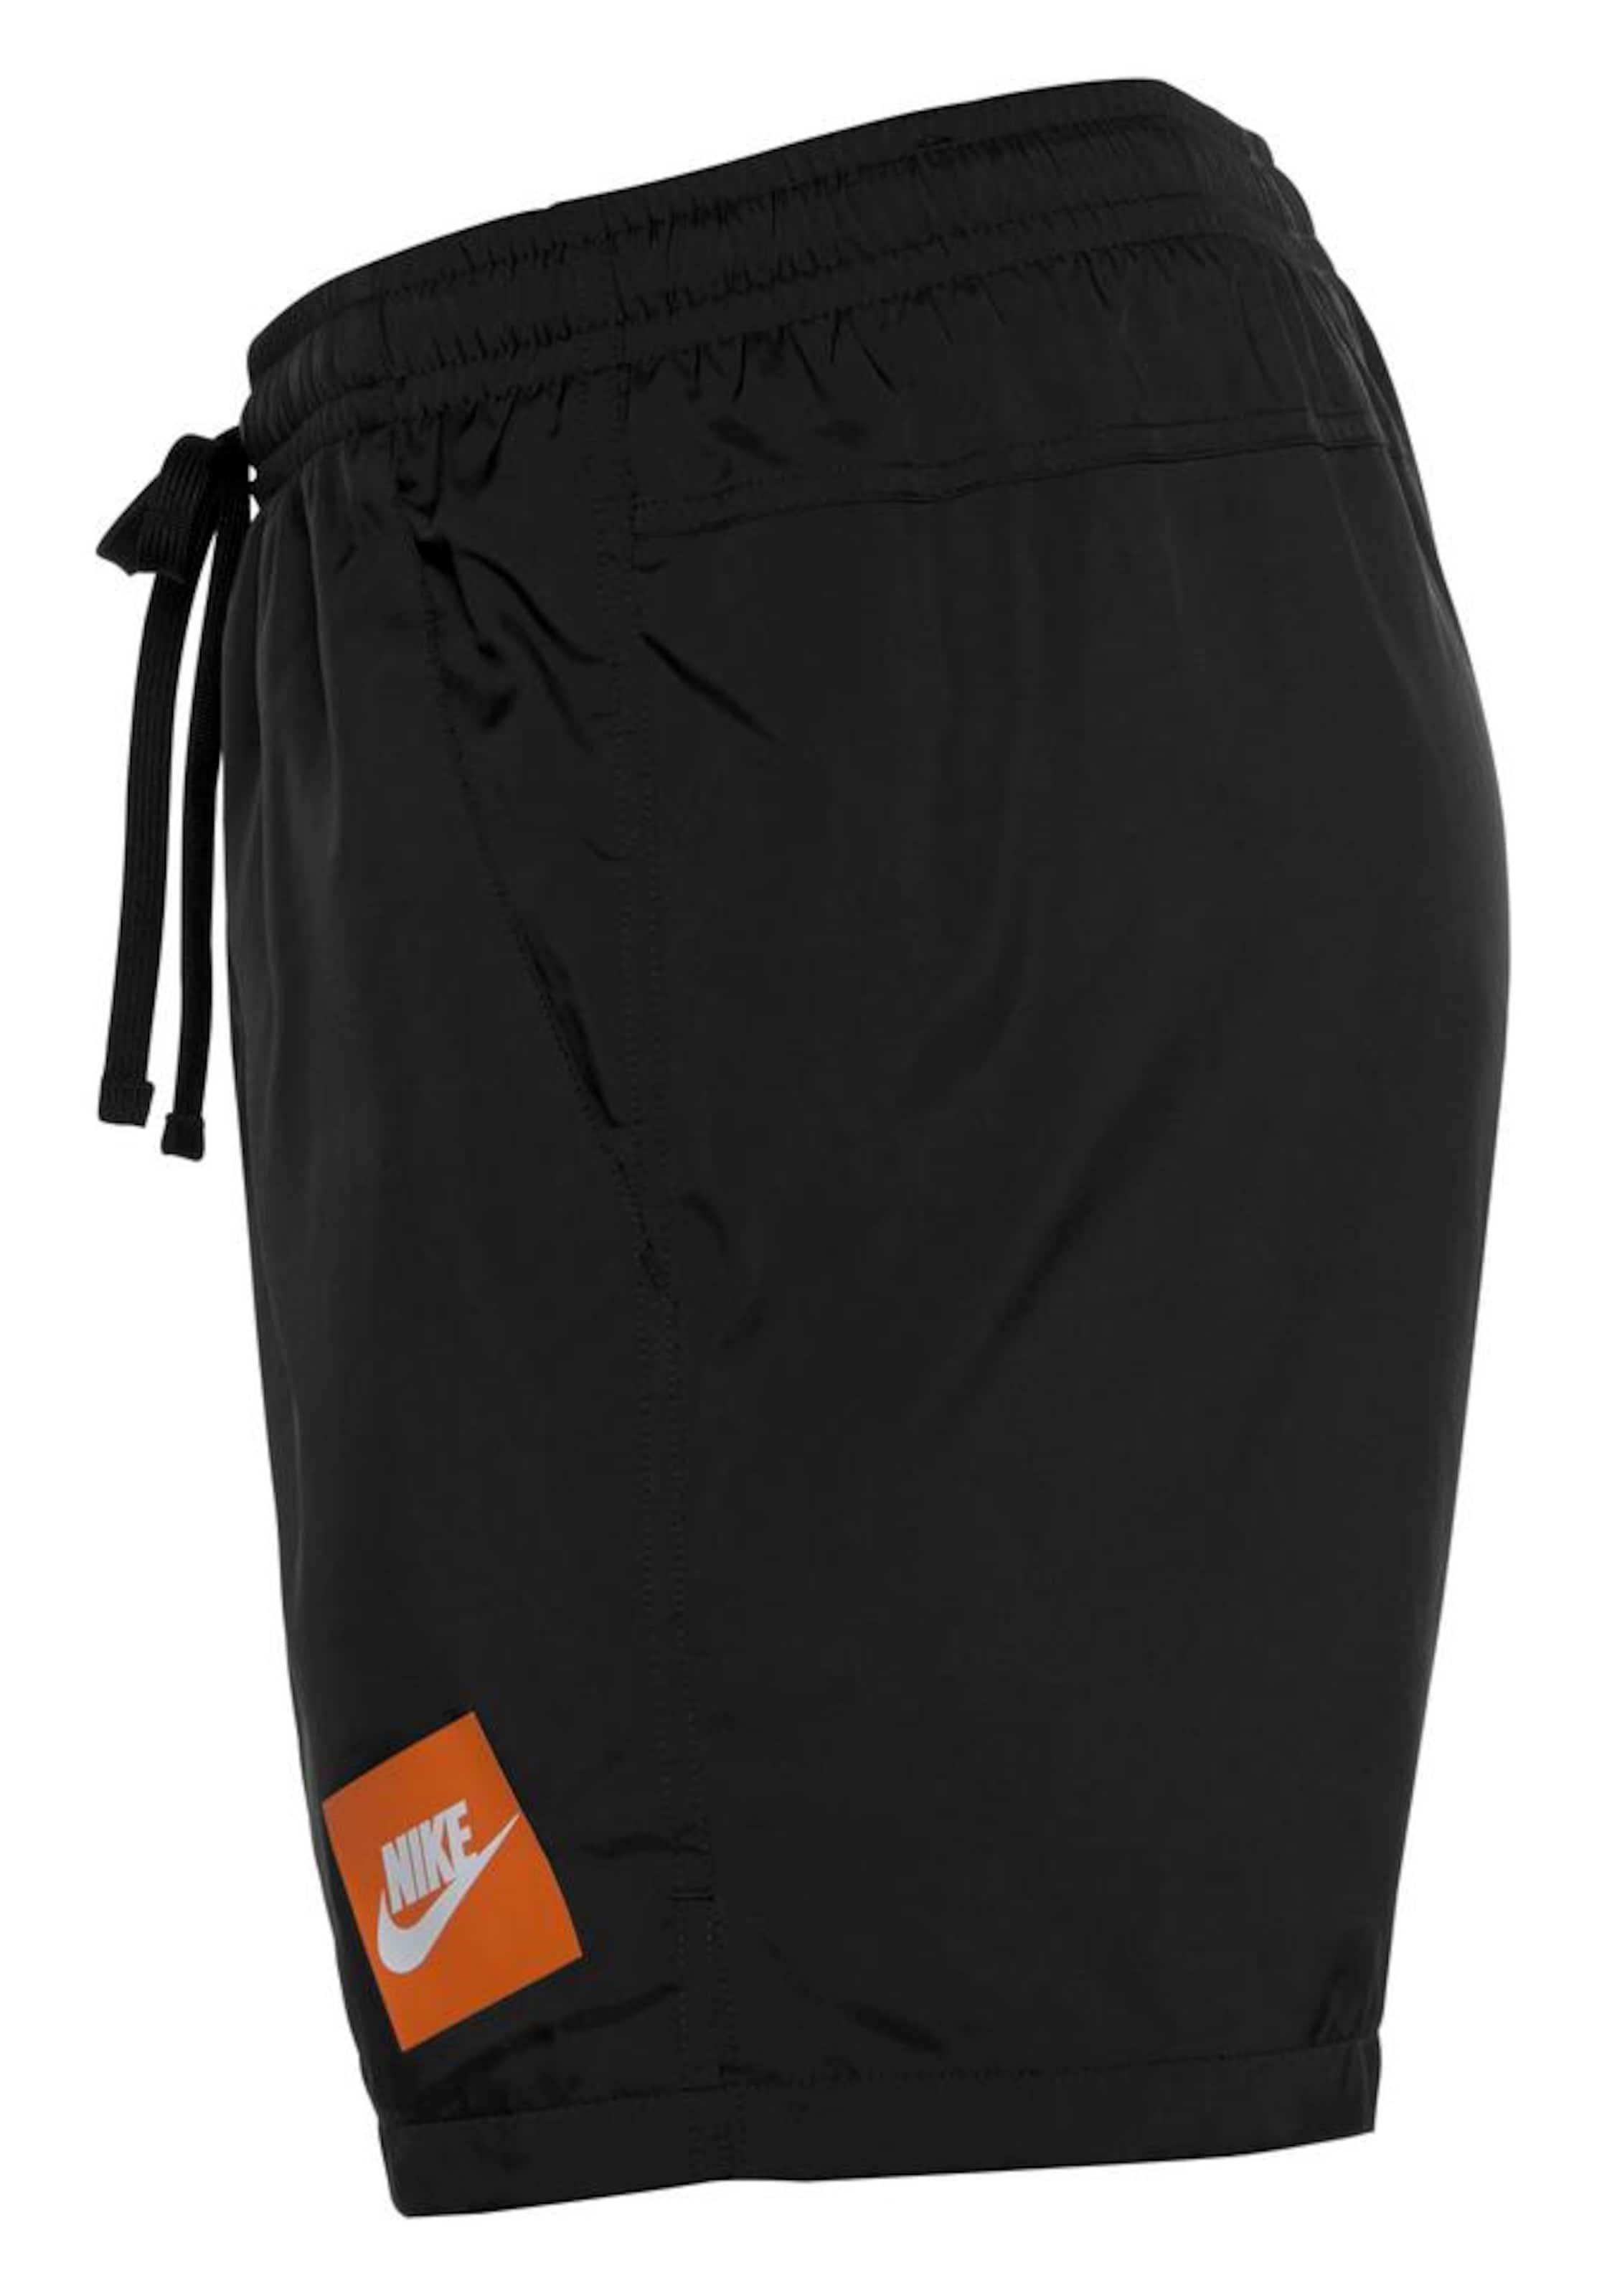 In Schwarz Sportswear Nike In Nike Shorts Sportswear Shorts OXukZPi